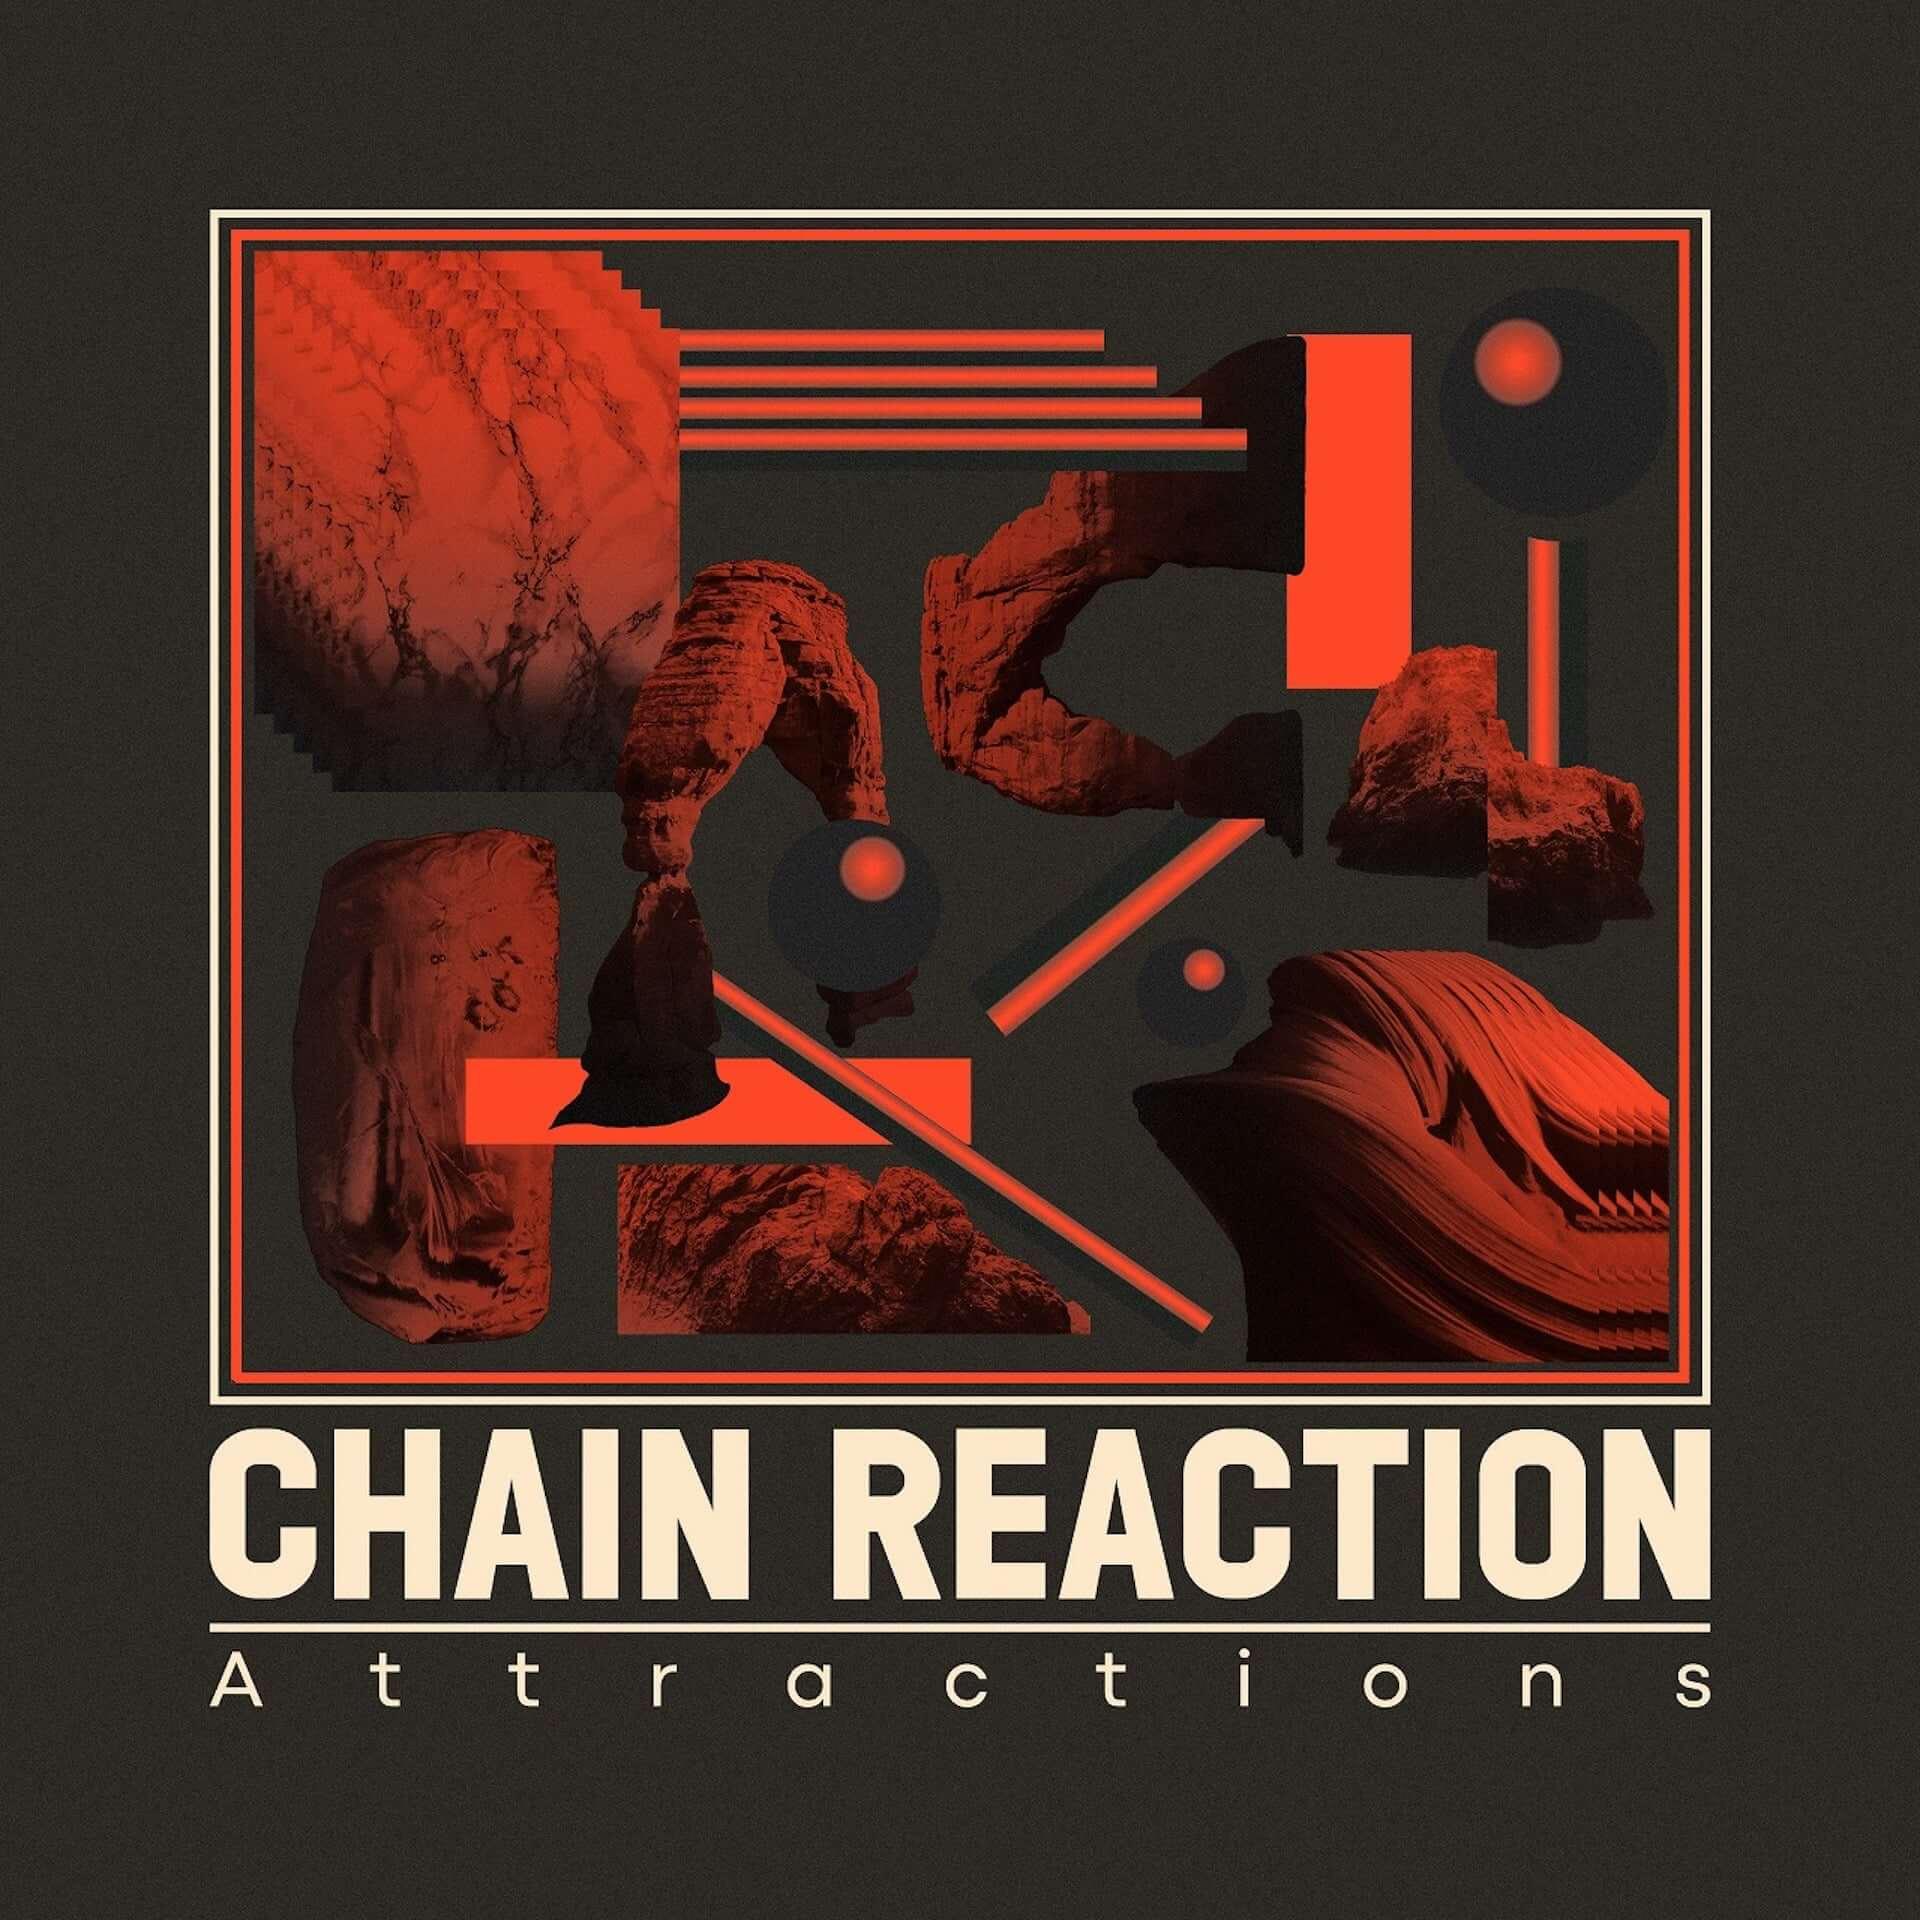 Attractions、9カ月振りの新曲「Chain Reaction」MVのティザー映像が公開 music200331_-attractions_3-1920x1920